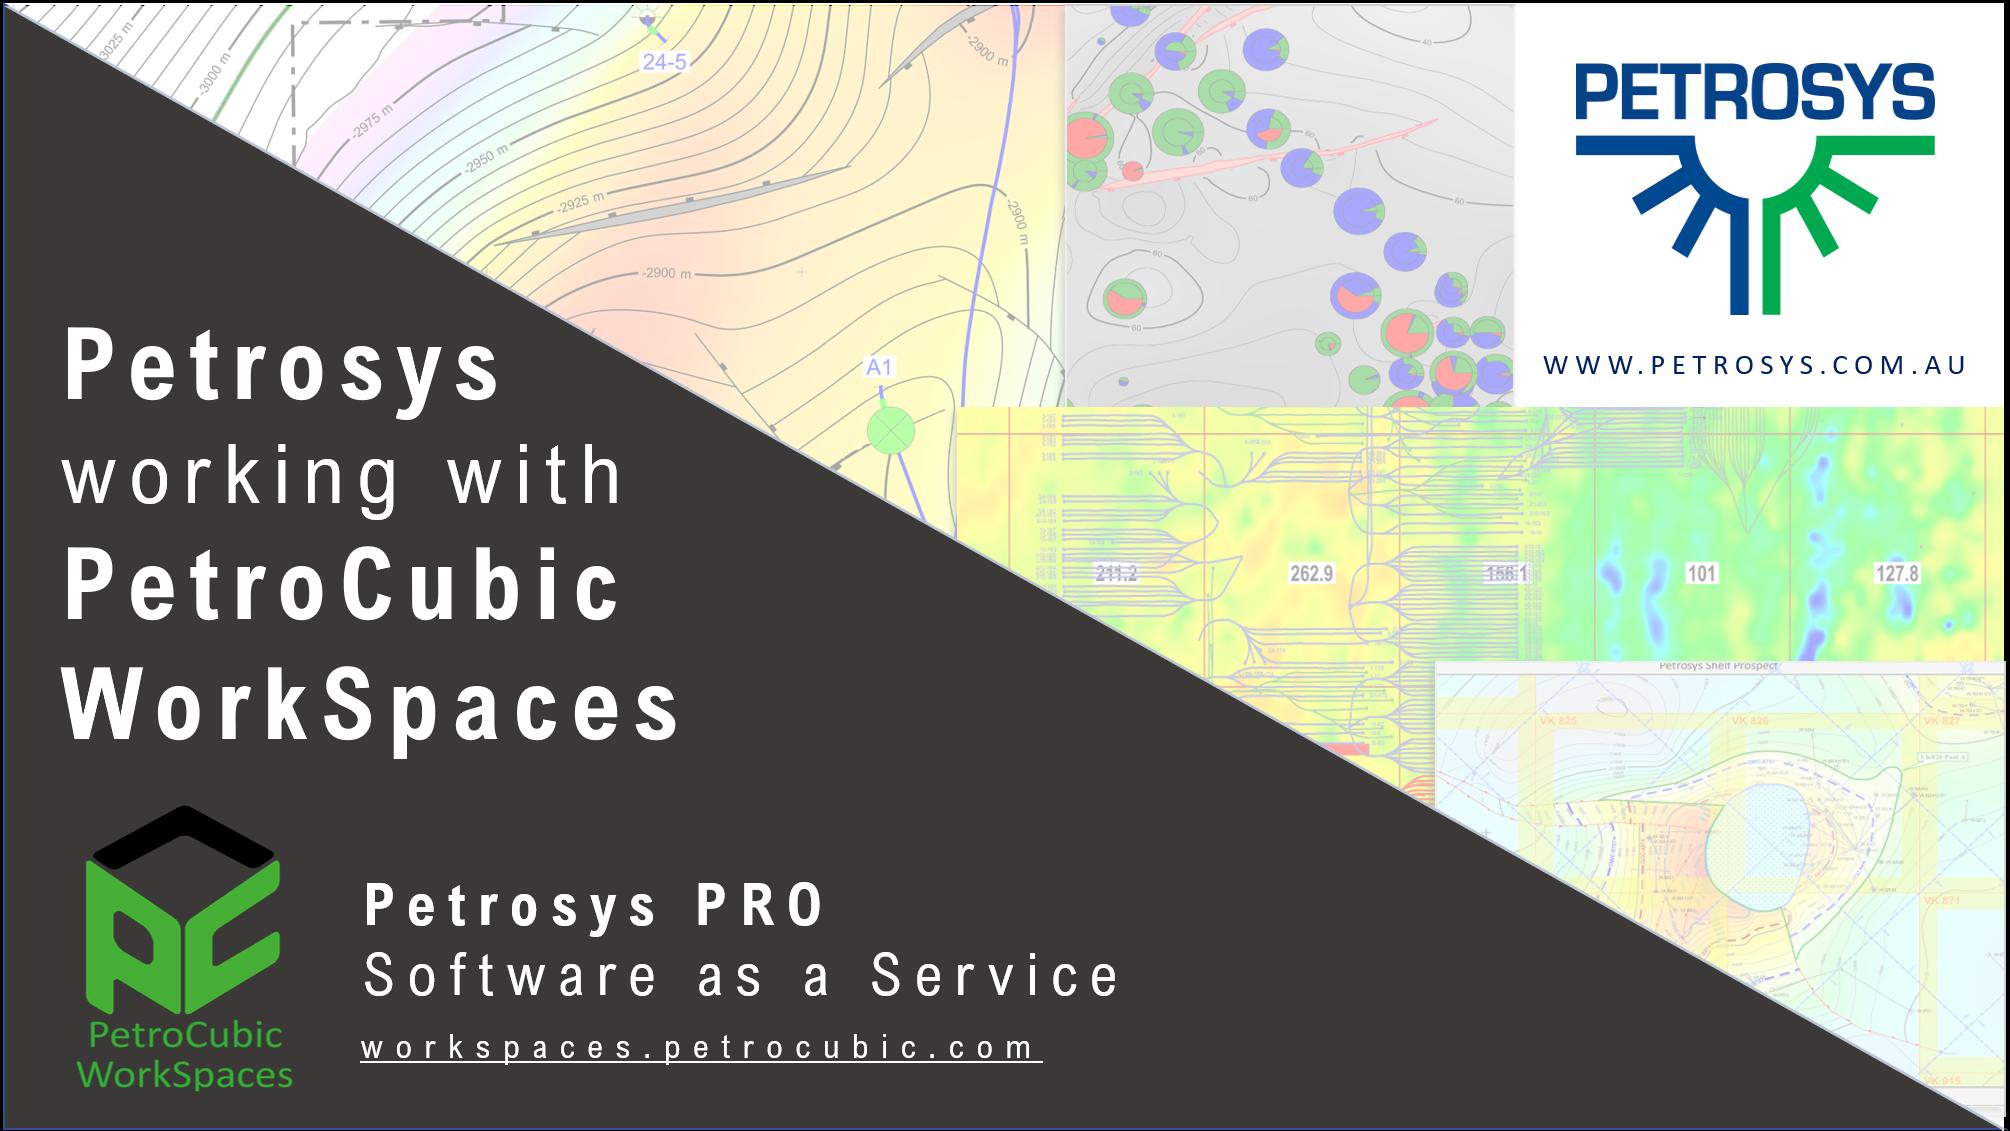 Petrosys partnership with PetroCubic WorkSpaces